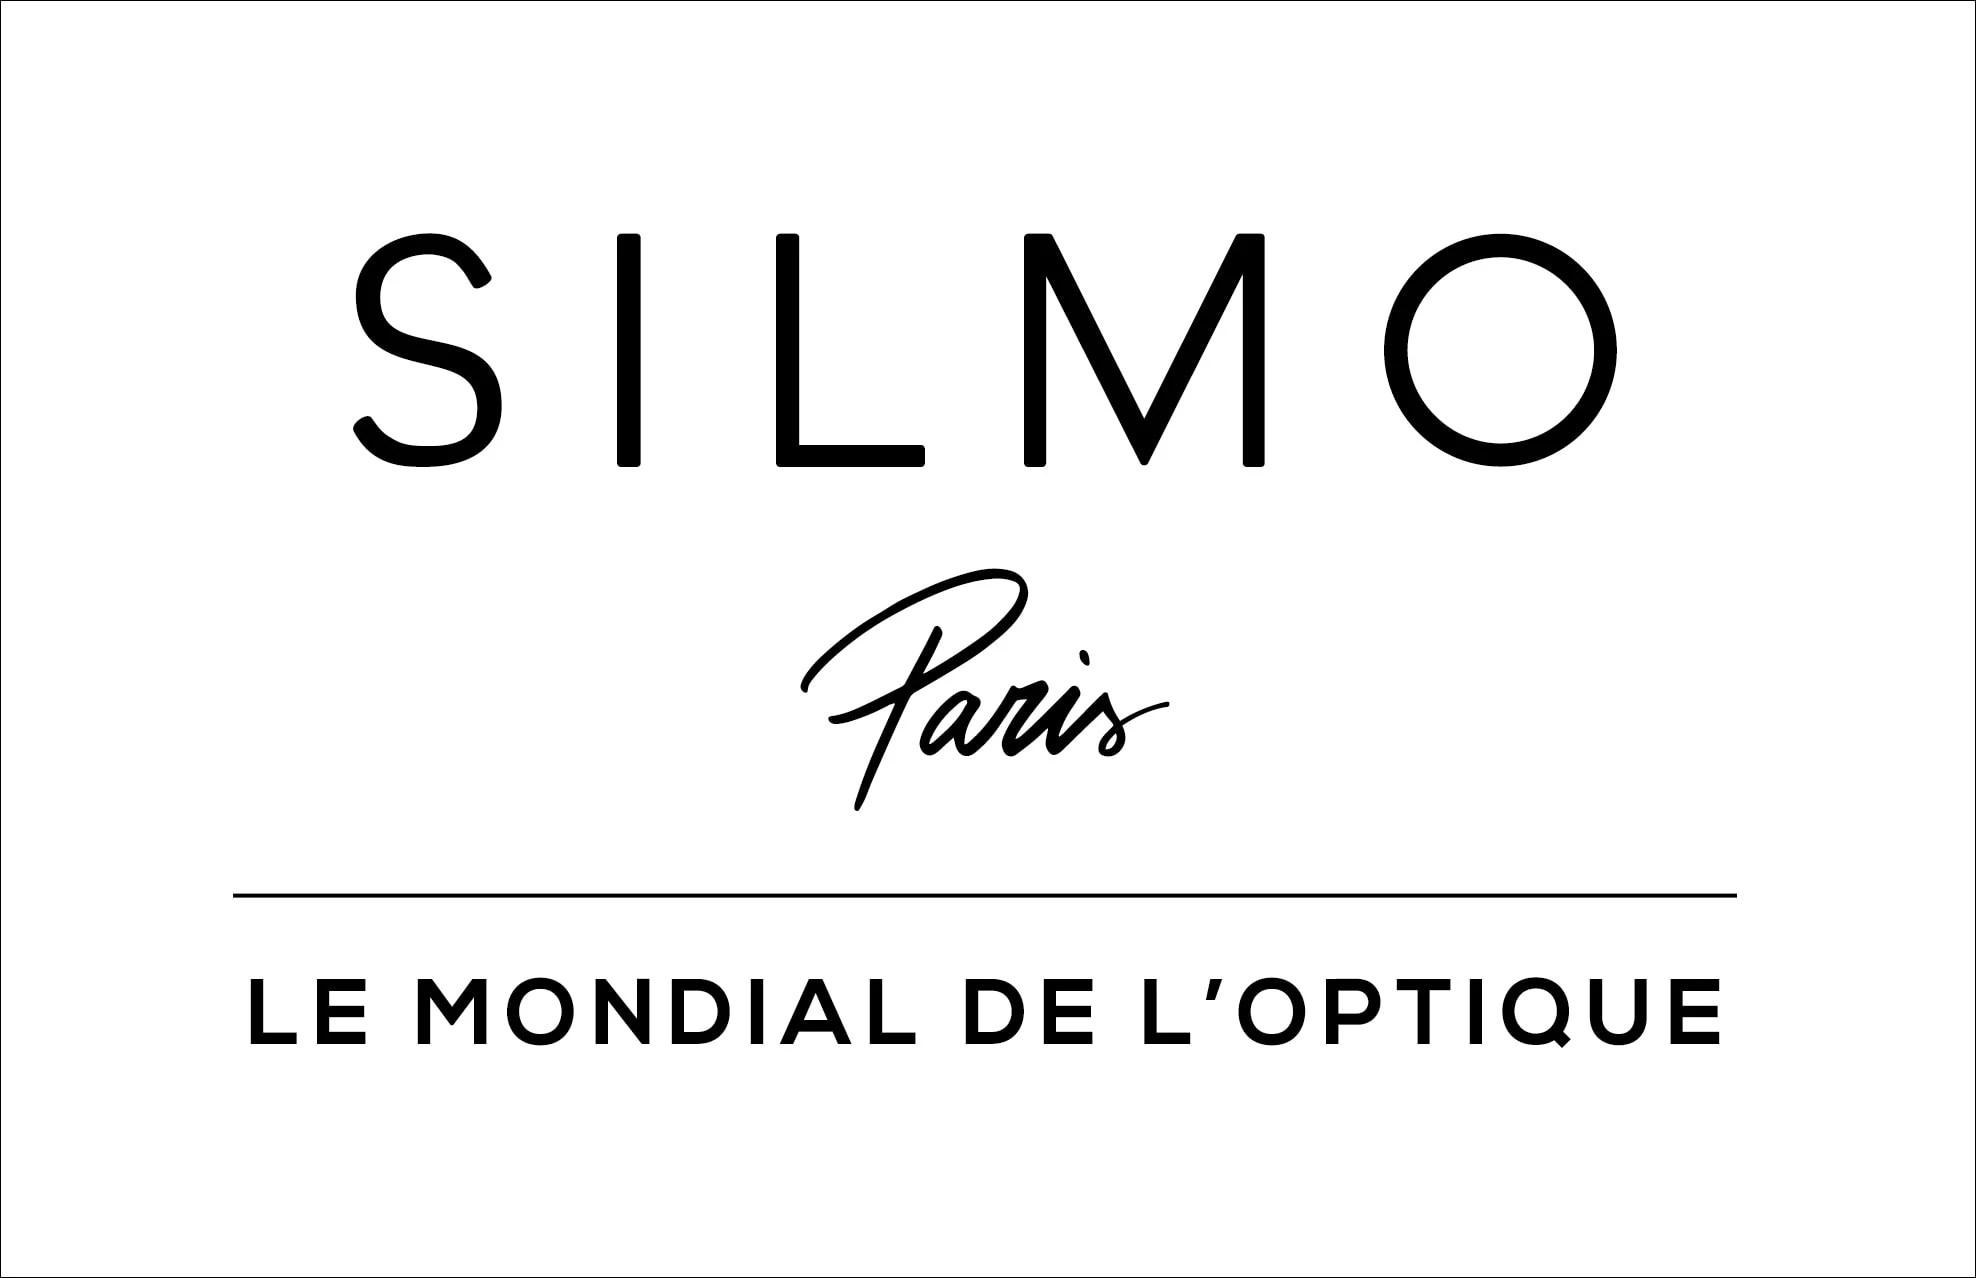 SILMO - A PROPOS